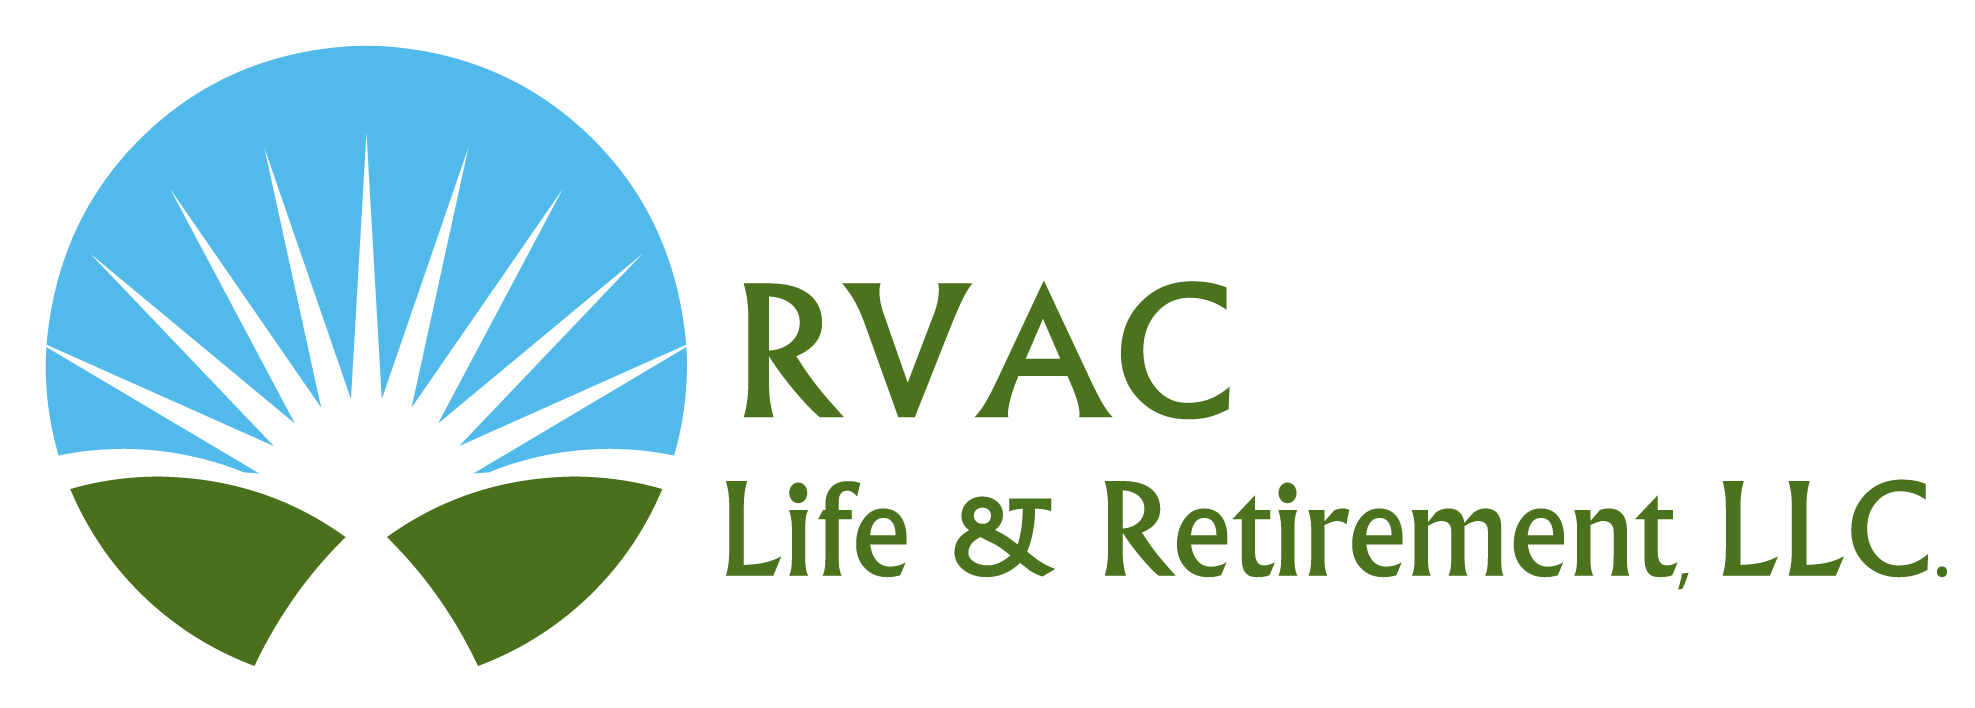 RVAC Life & Retirement, LLC.